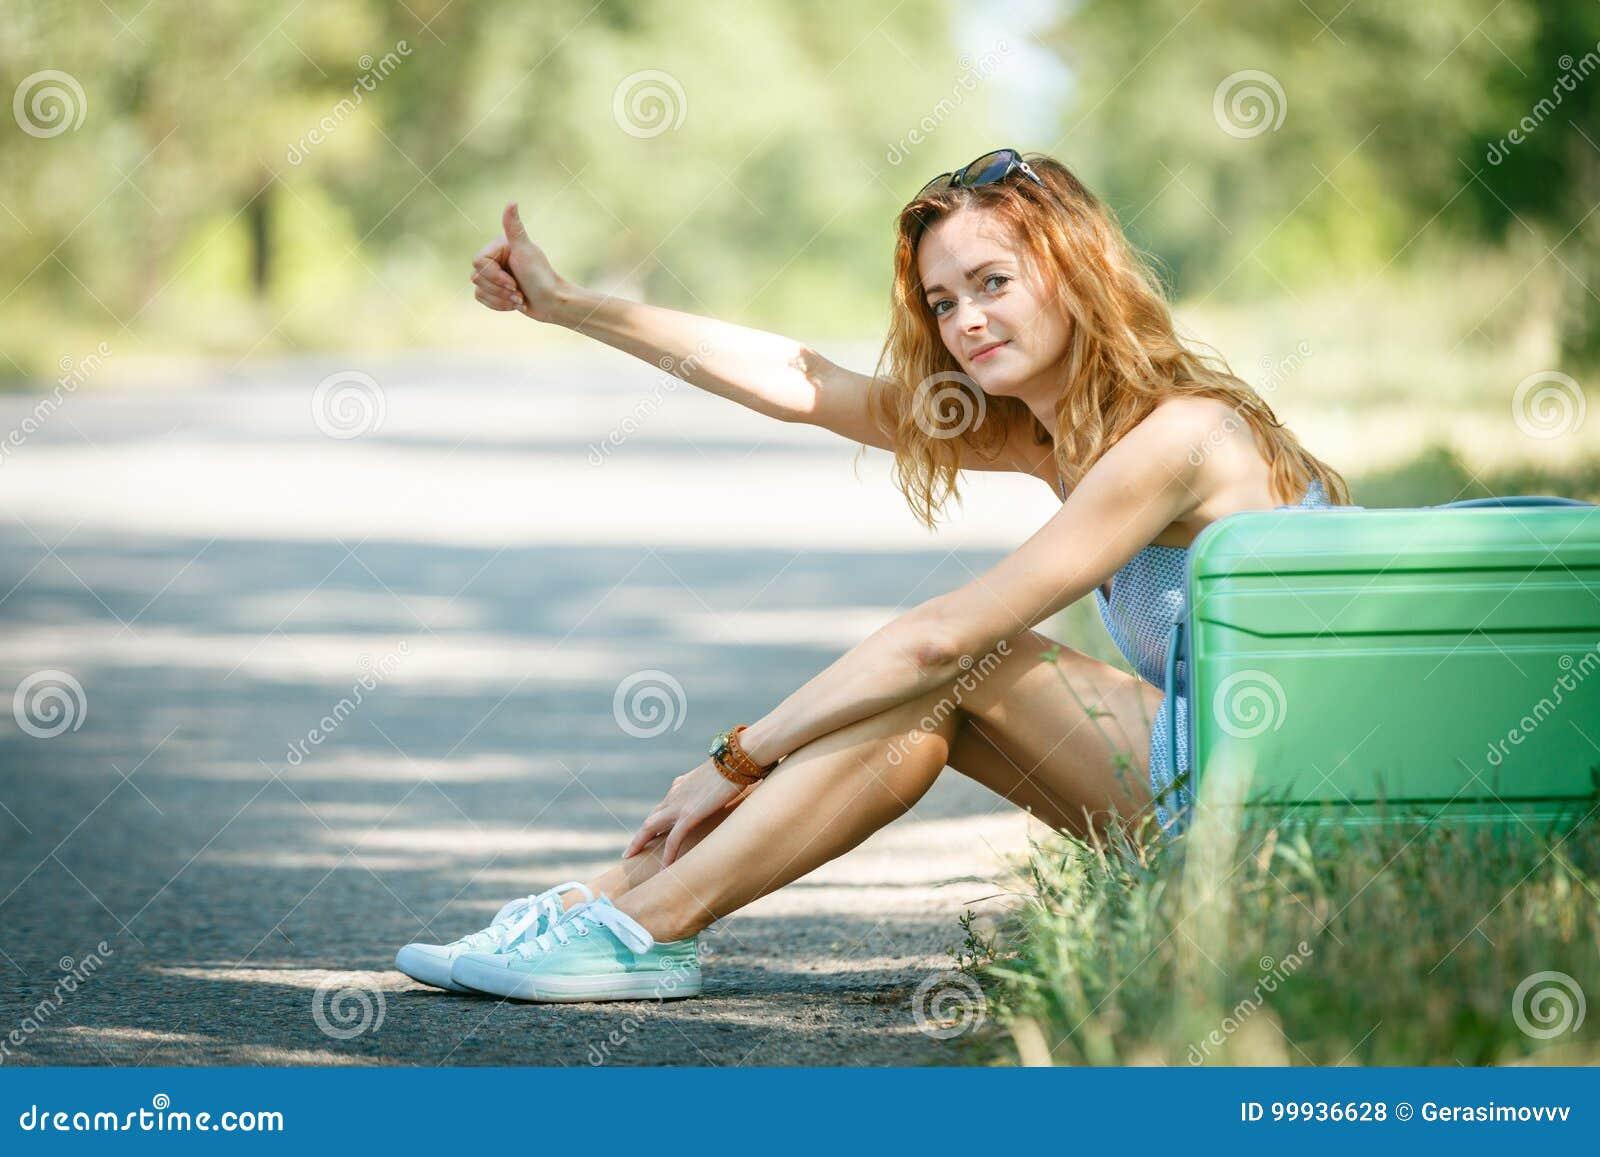 Tired Hitchhiking girl